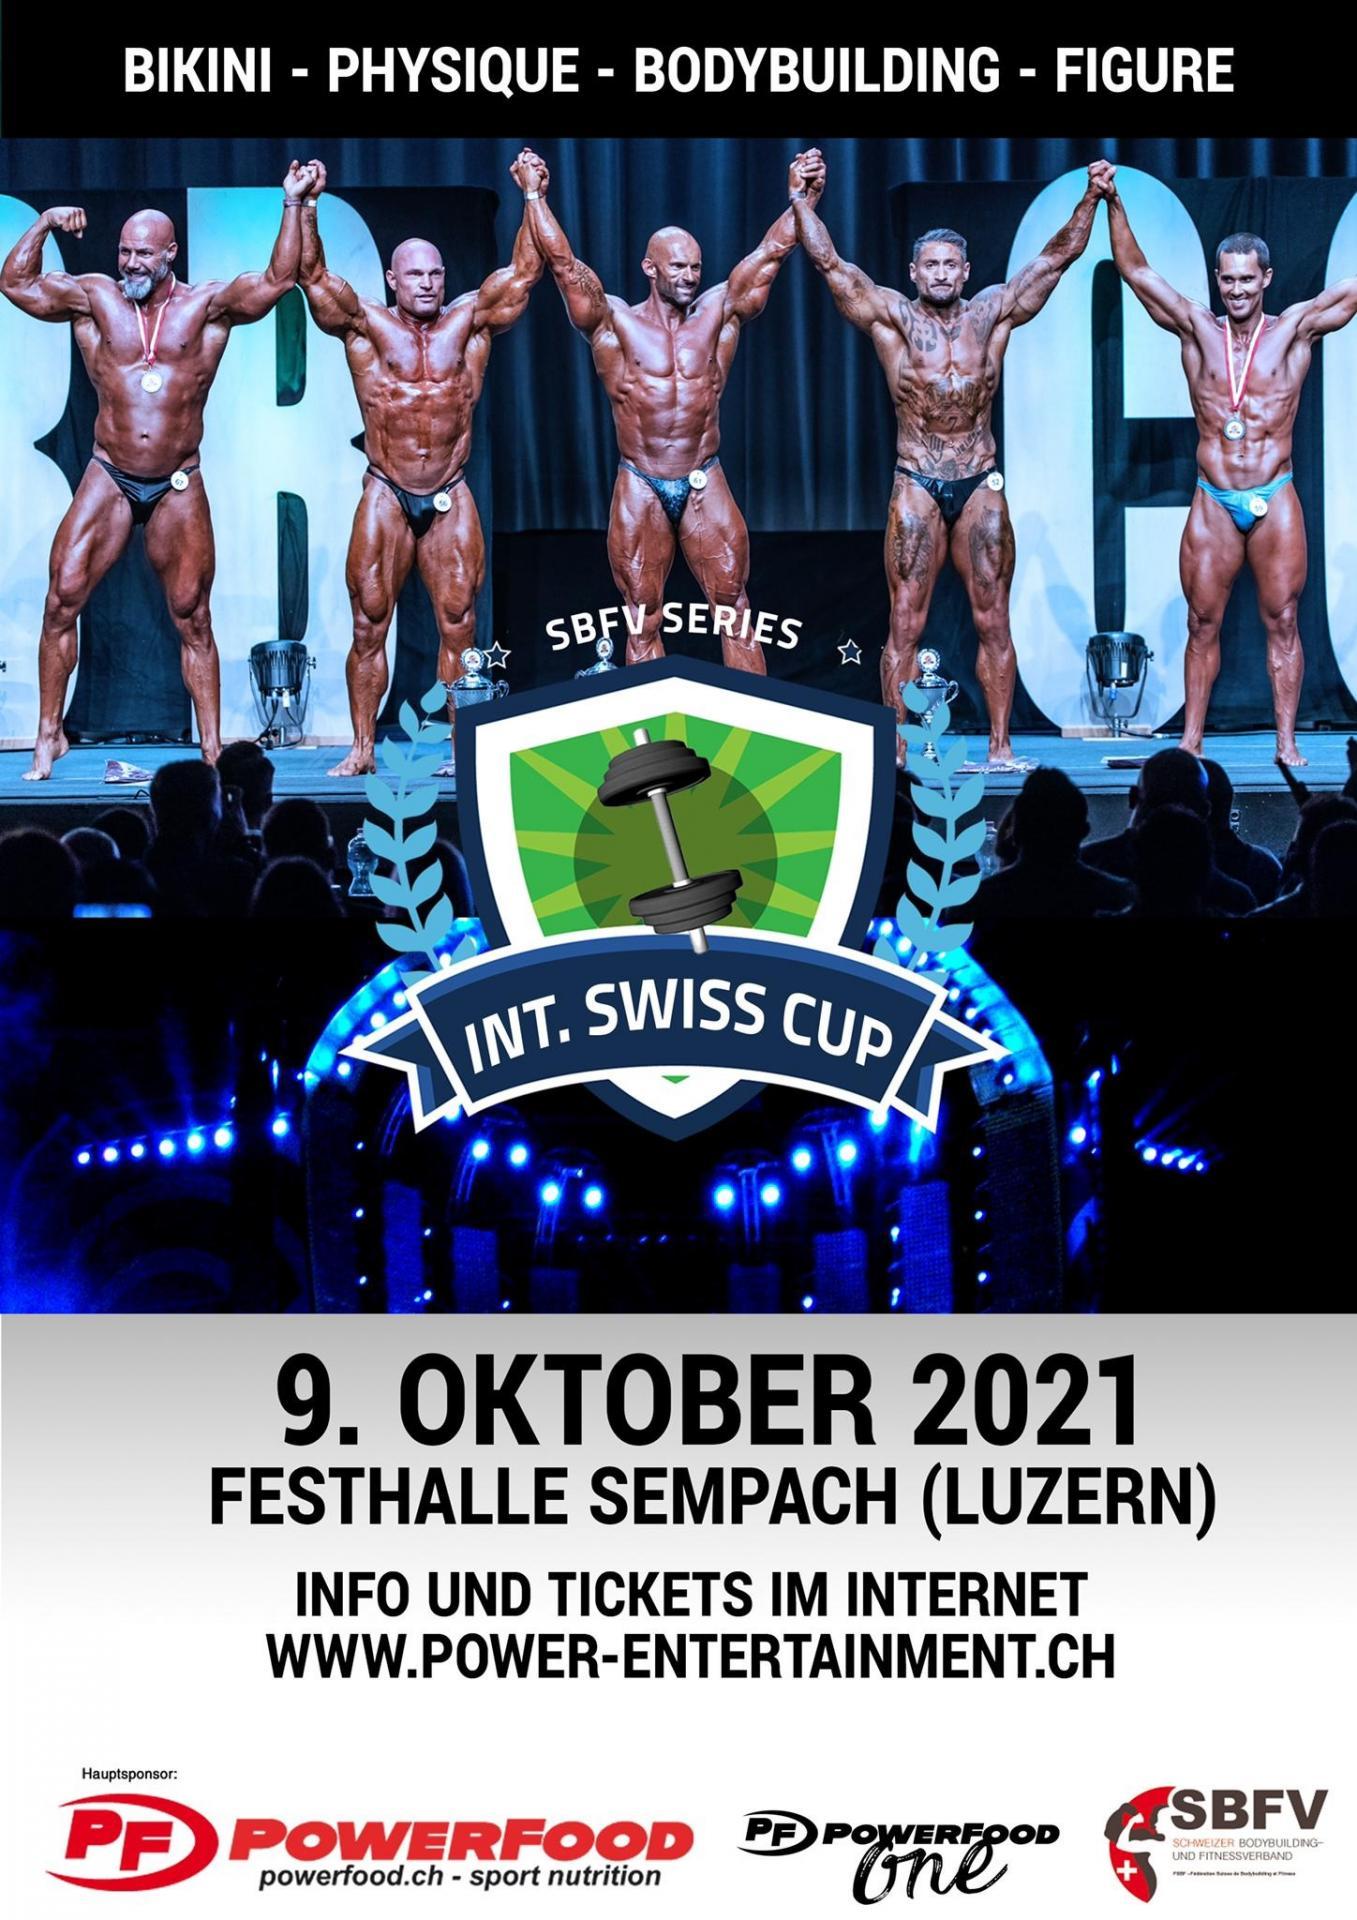 Swisscup2021 1